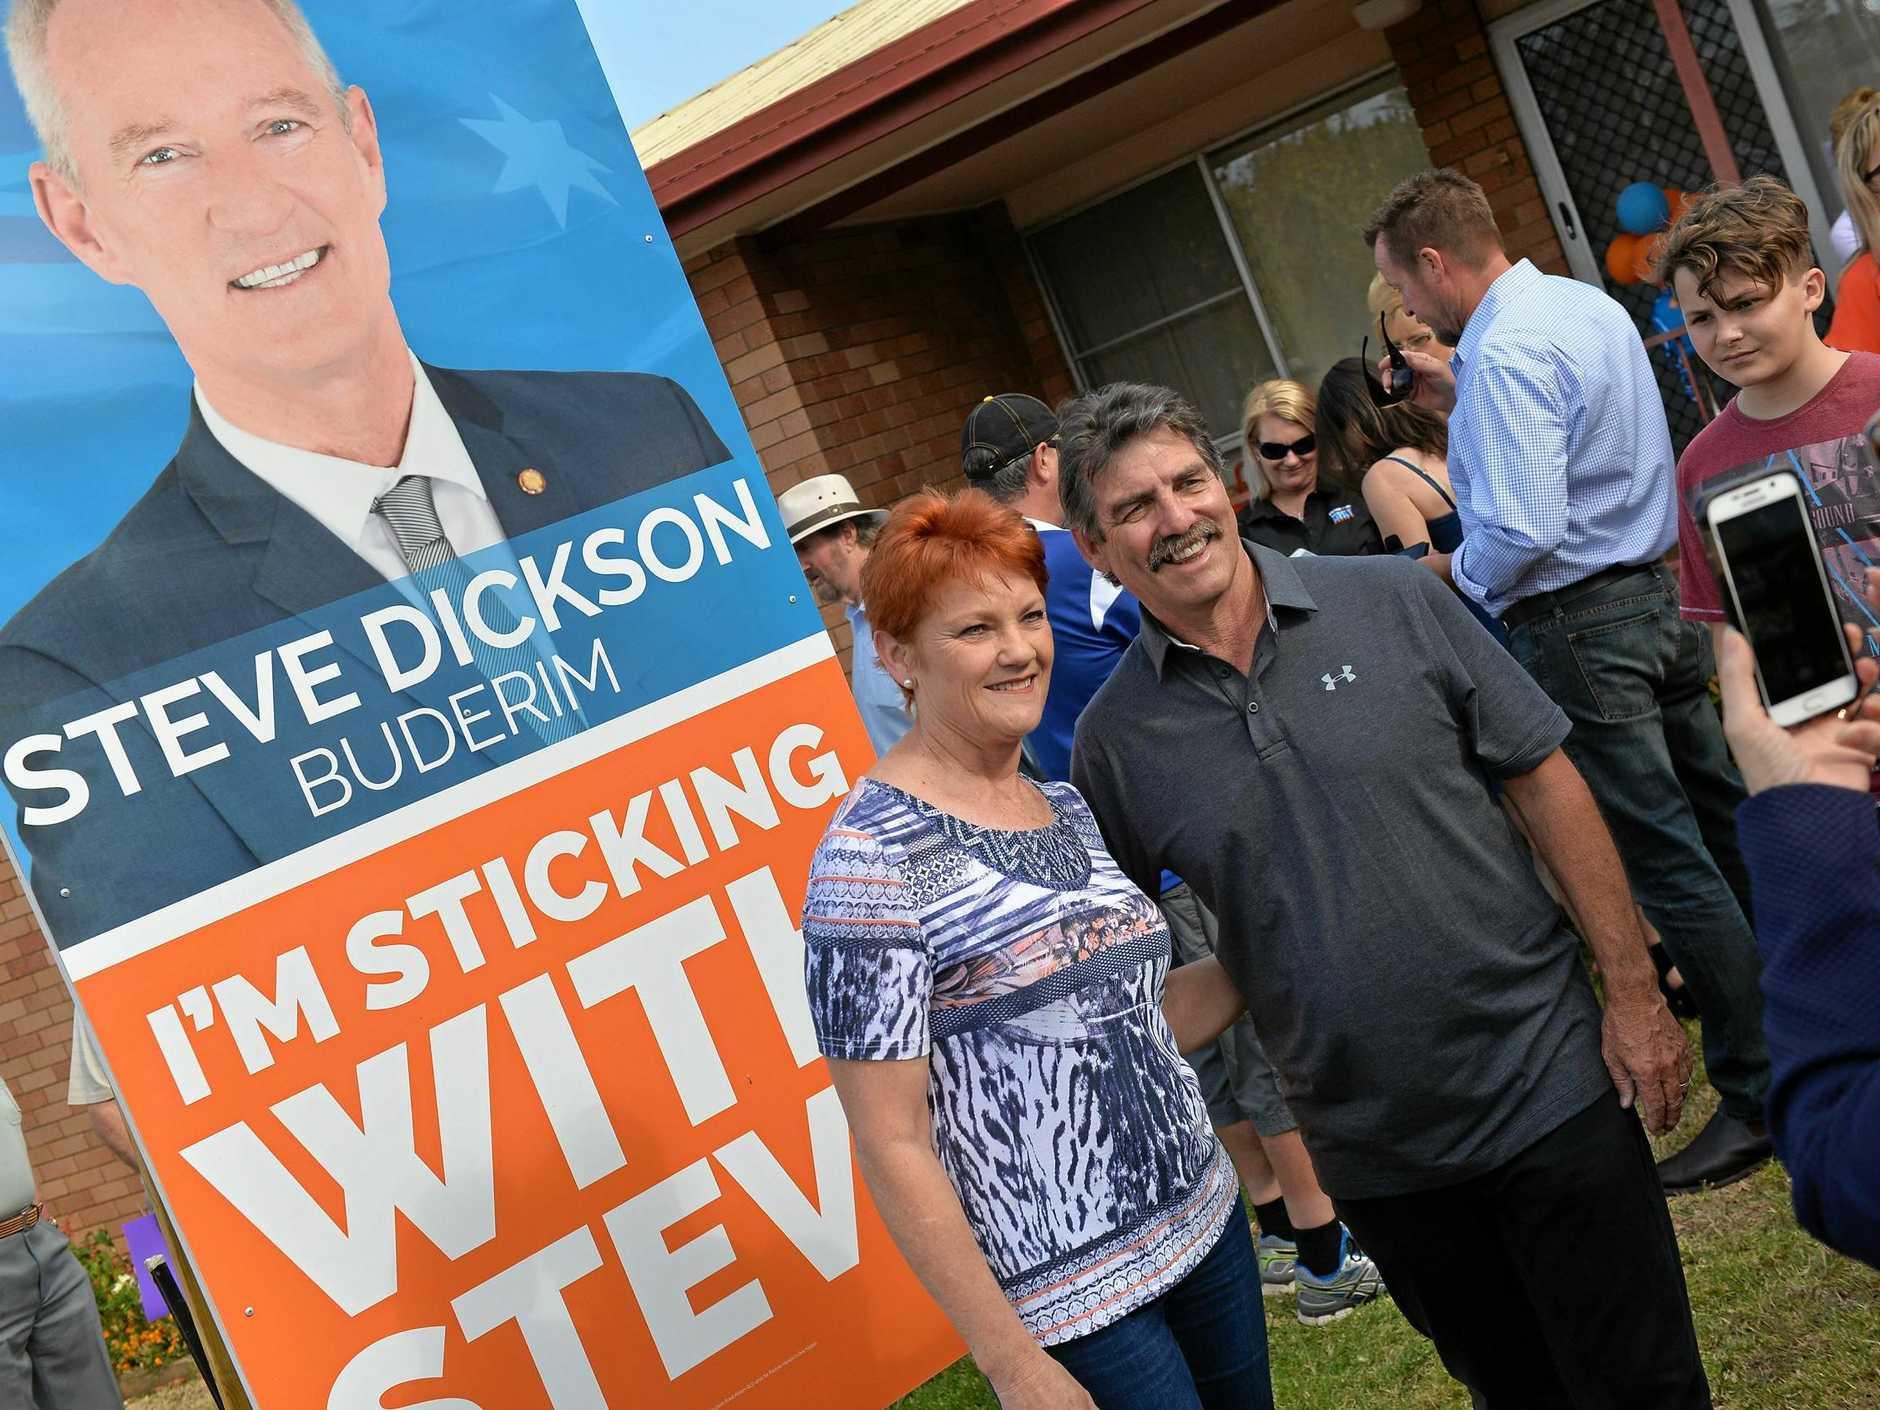 Pauline Hanson and Steve Dickson attend a community BBQ in Buderim. Pauline Hanson and Shane Truscott.